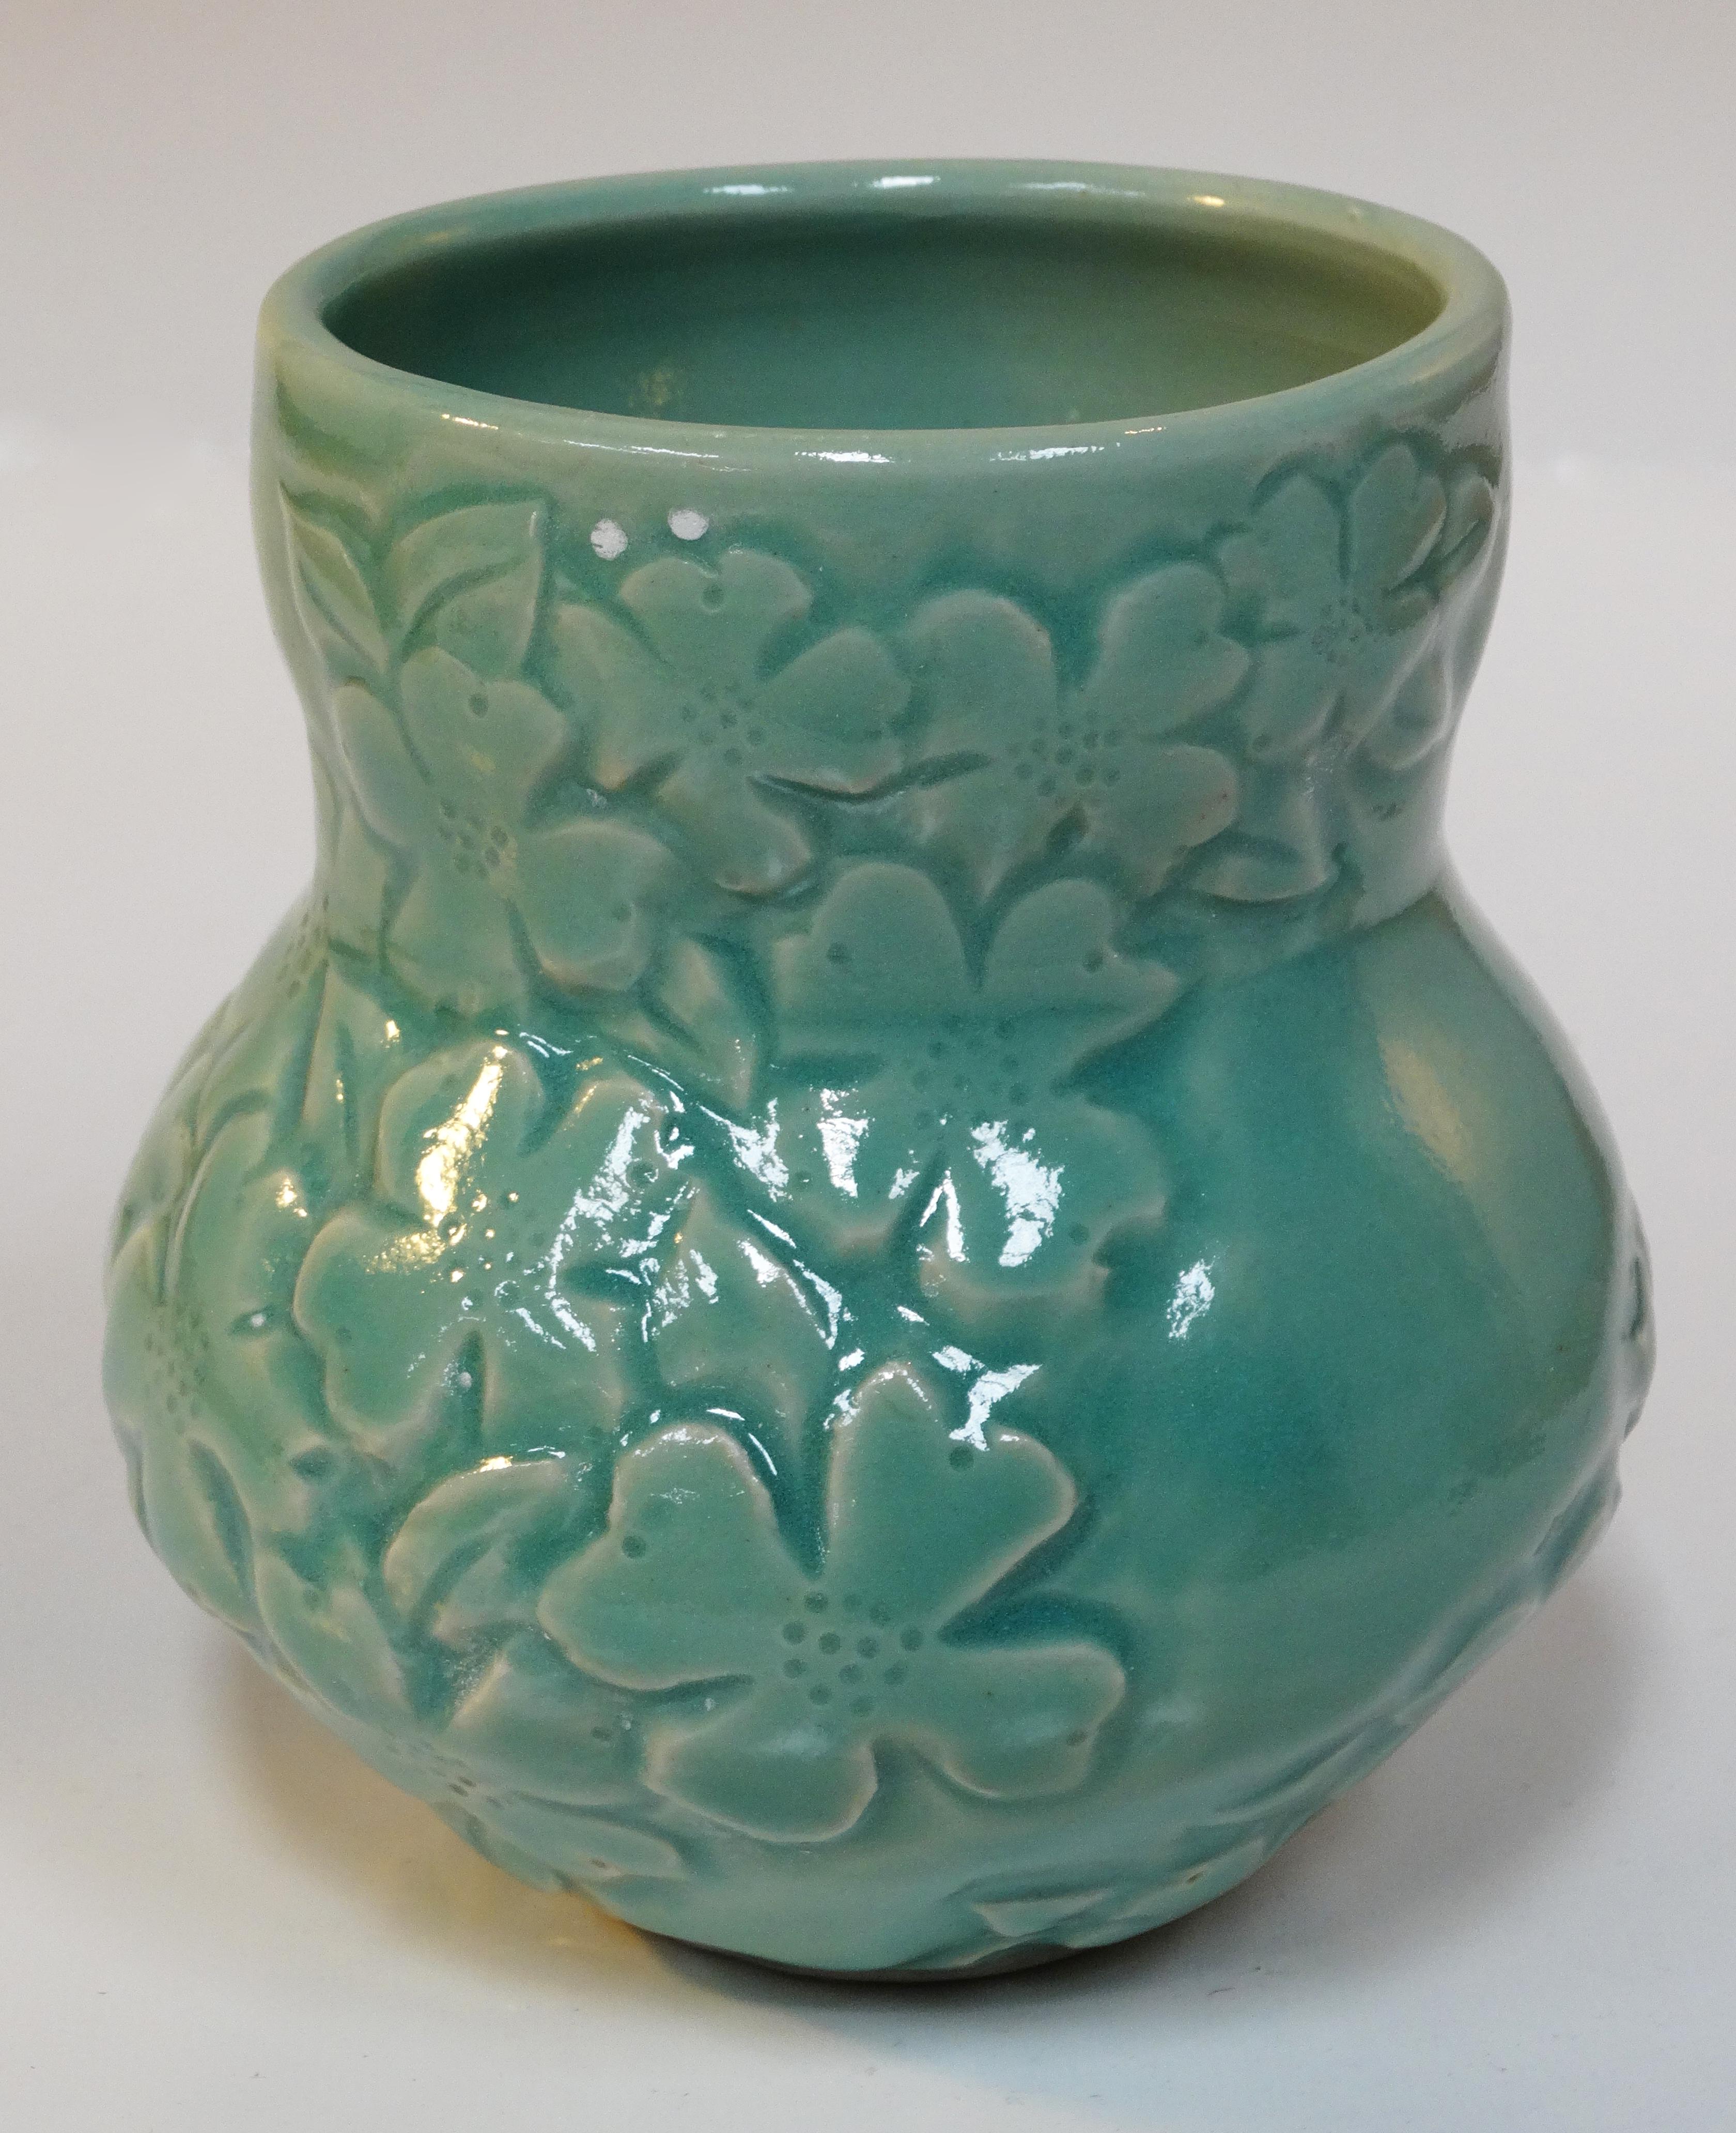 Dogwwod Small Vase Chun Celadon